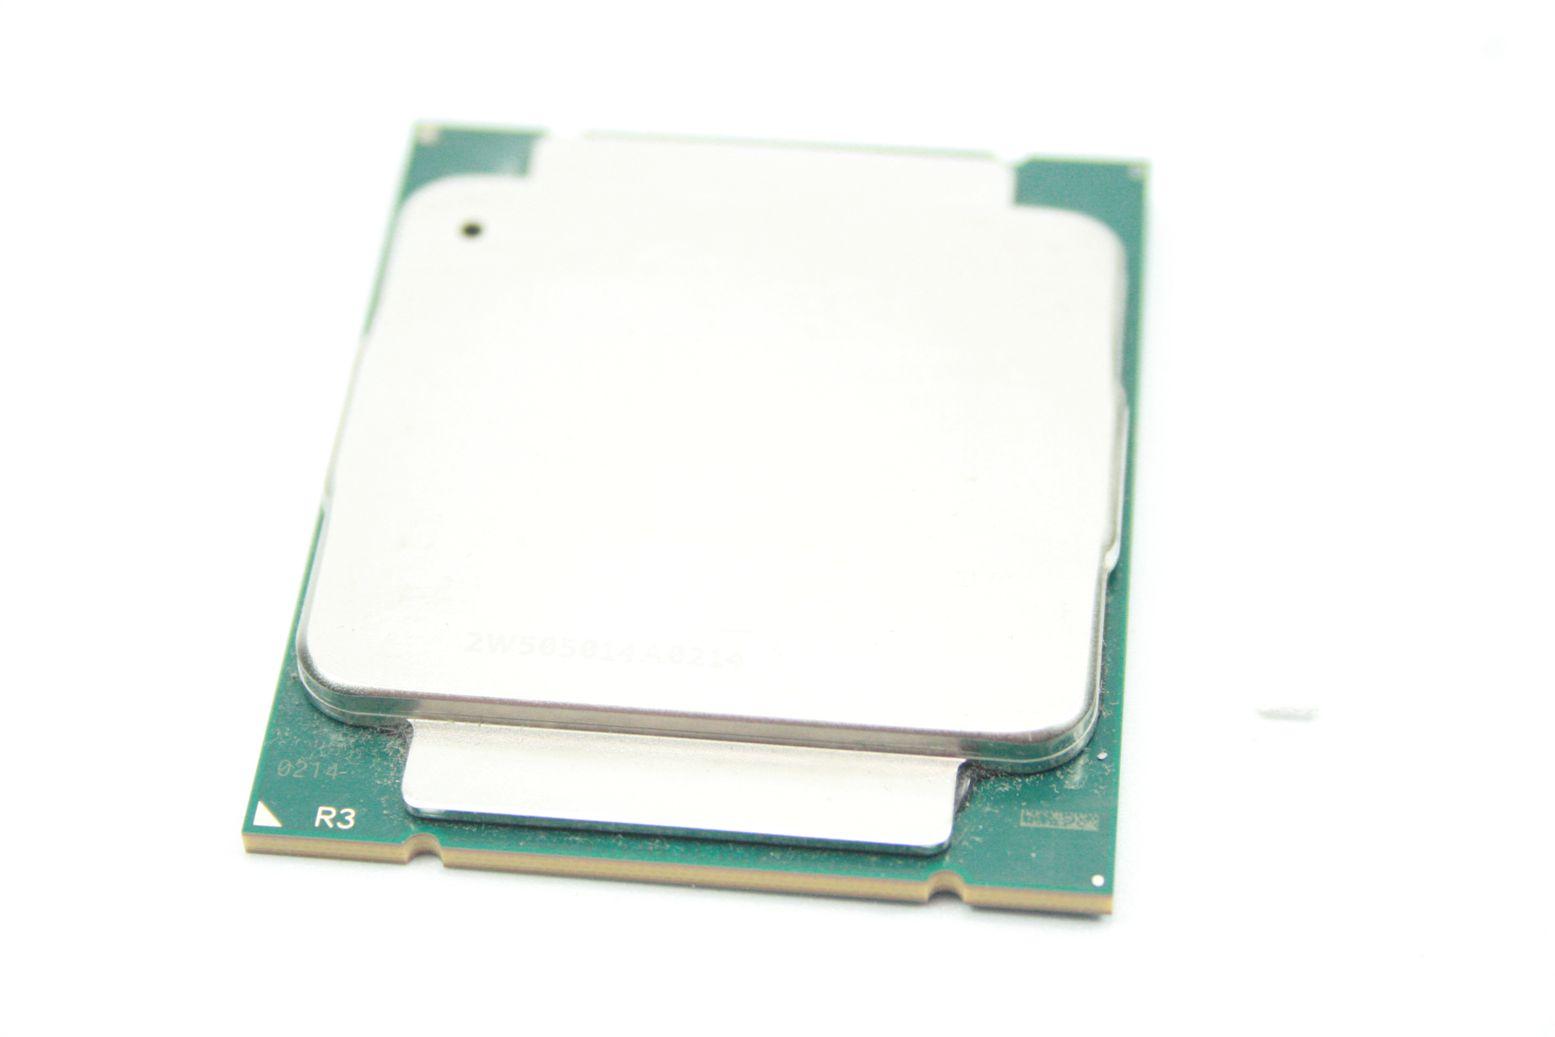 INTEL XEON 22 CORE E5-2699A v4 SR30Y (55M Cache, 2.40 GHz) FCLGA2011 SR30Y